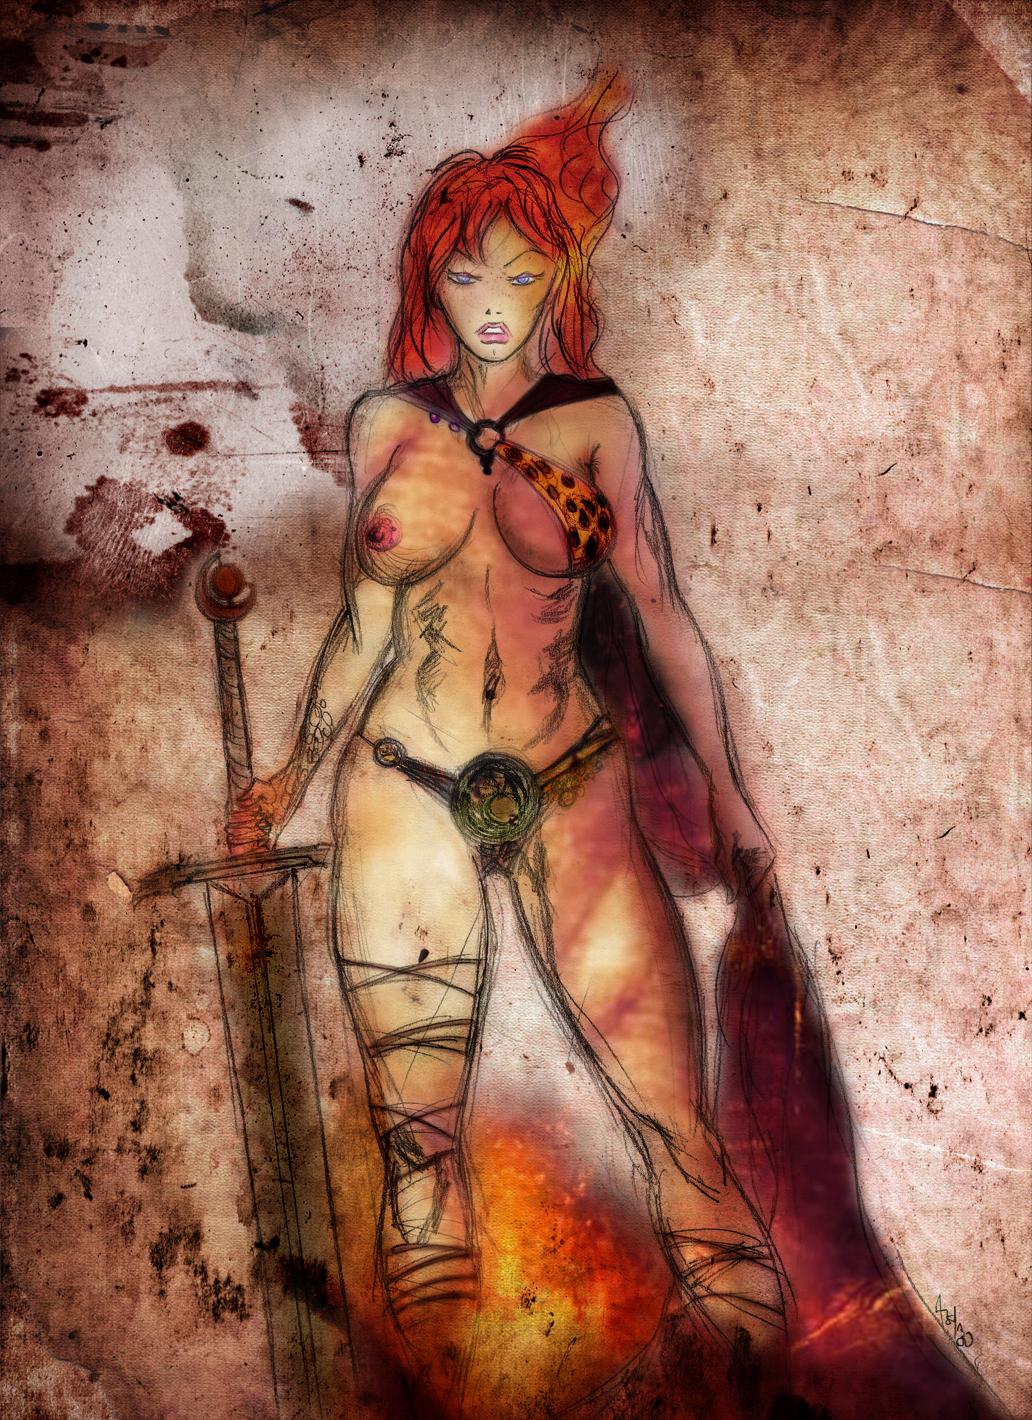 Amazon warrior hentai adult movies